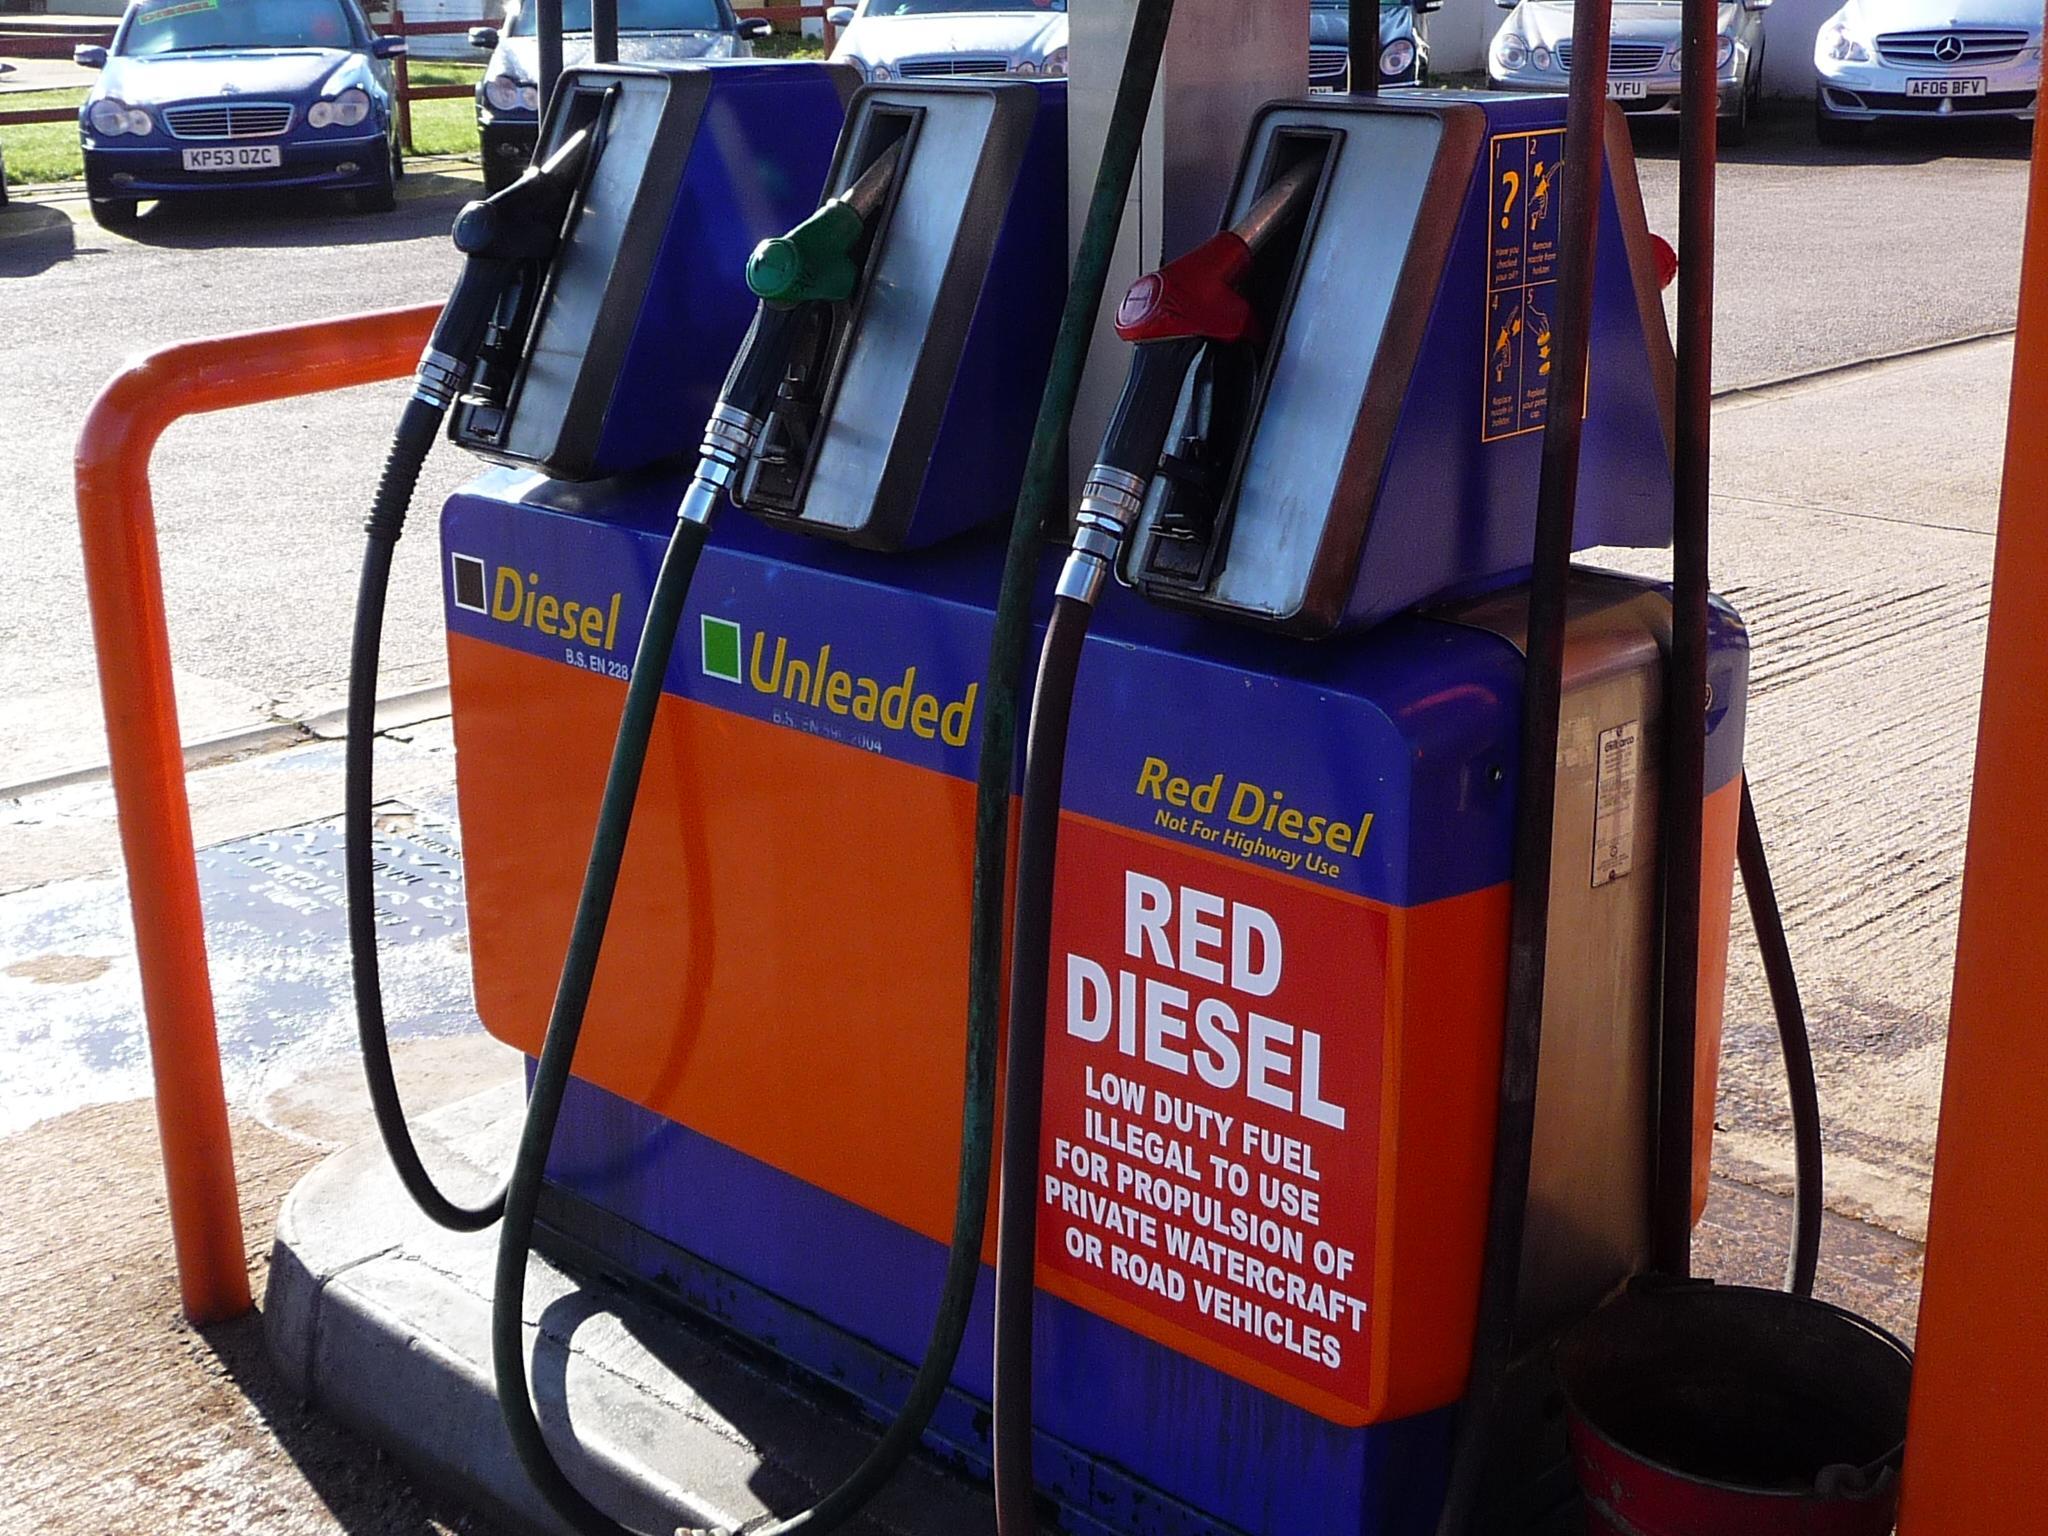 red diesel pump next to a diesel and unleaded pump - misfuel potential